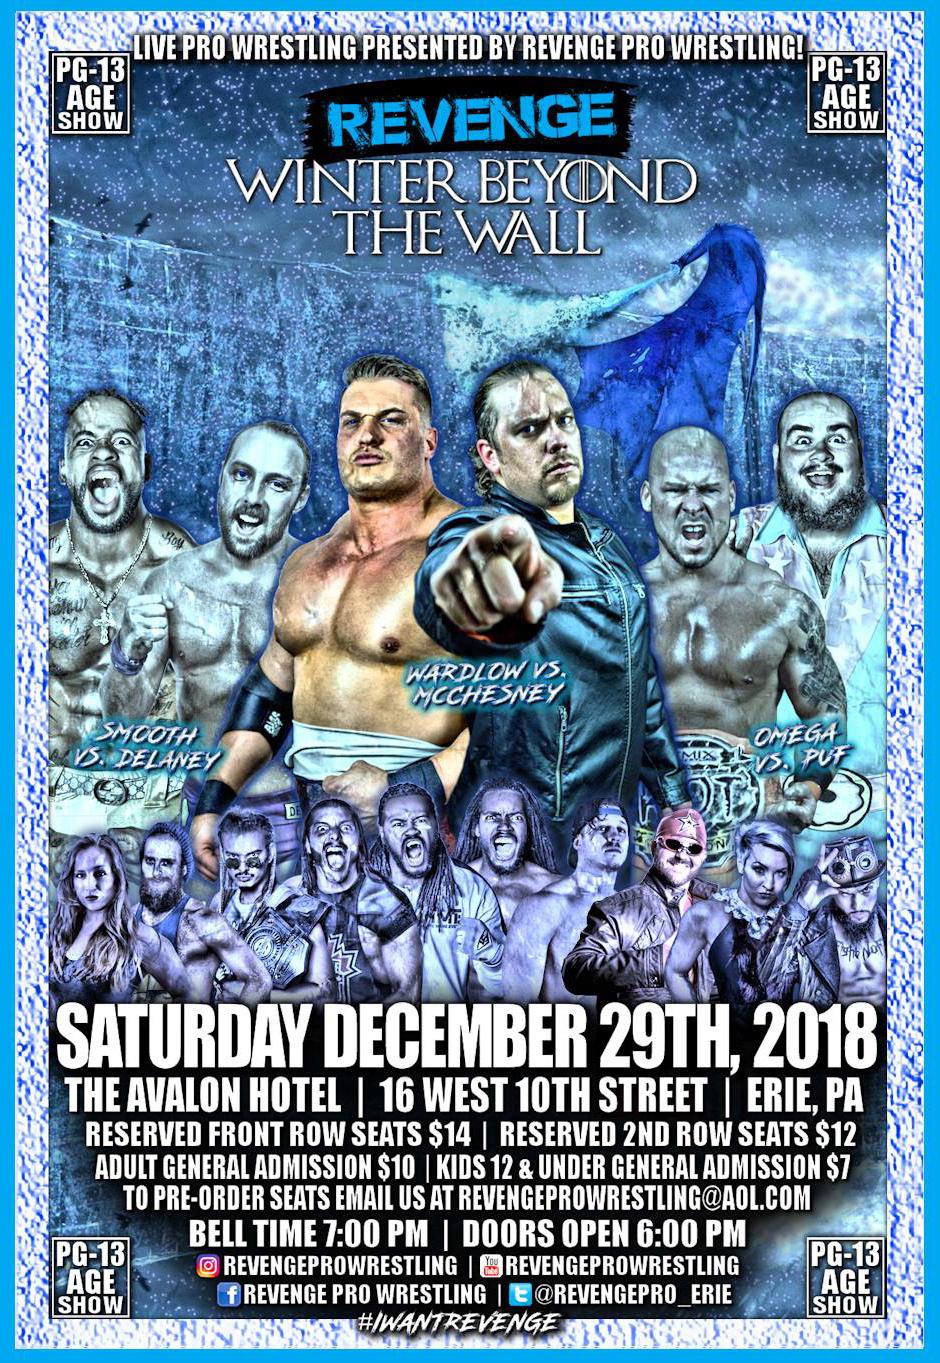 Revenge Pro - Winter Beyond the Wall (12.29.2018)